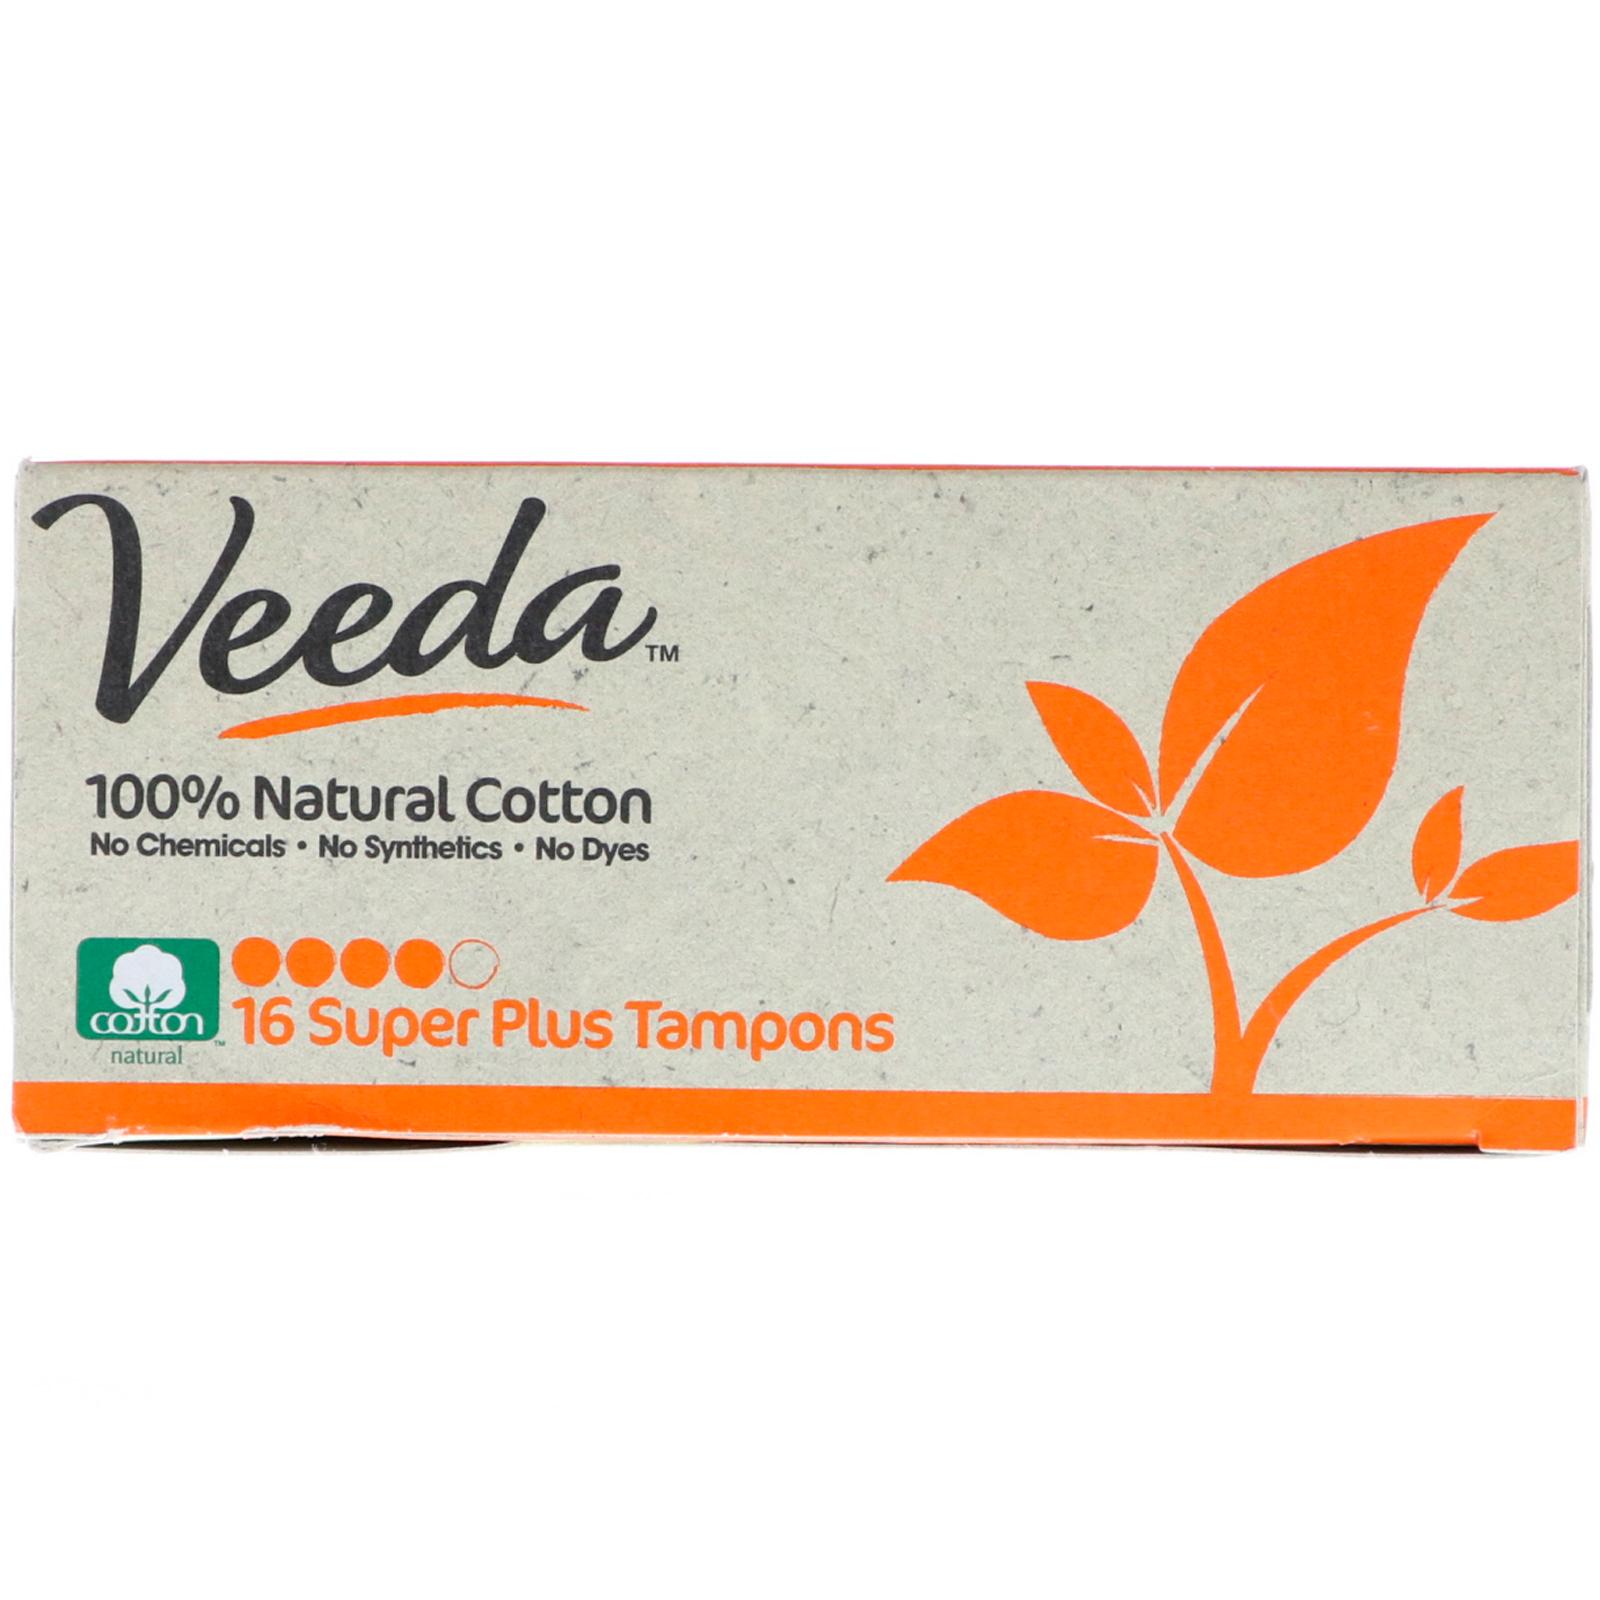 veeda 100 natural cotton tampon super plus 16 tampons. Black Bedroom Furniture Sets. Home Design Ideas